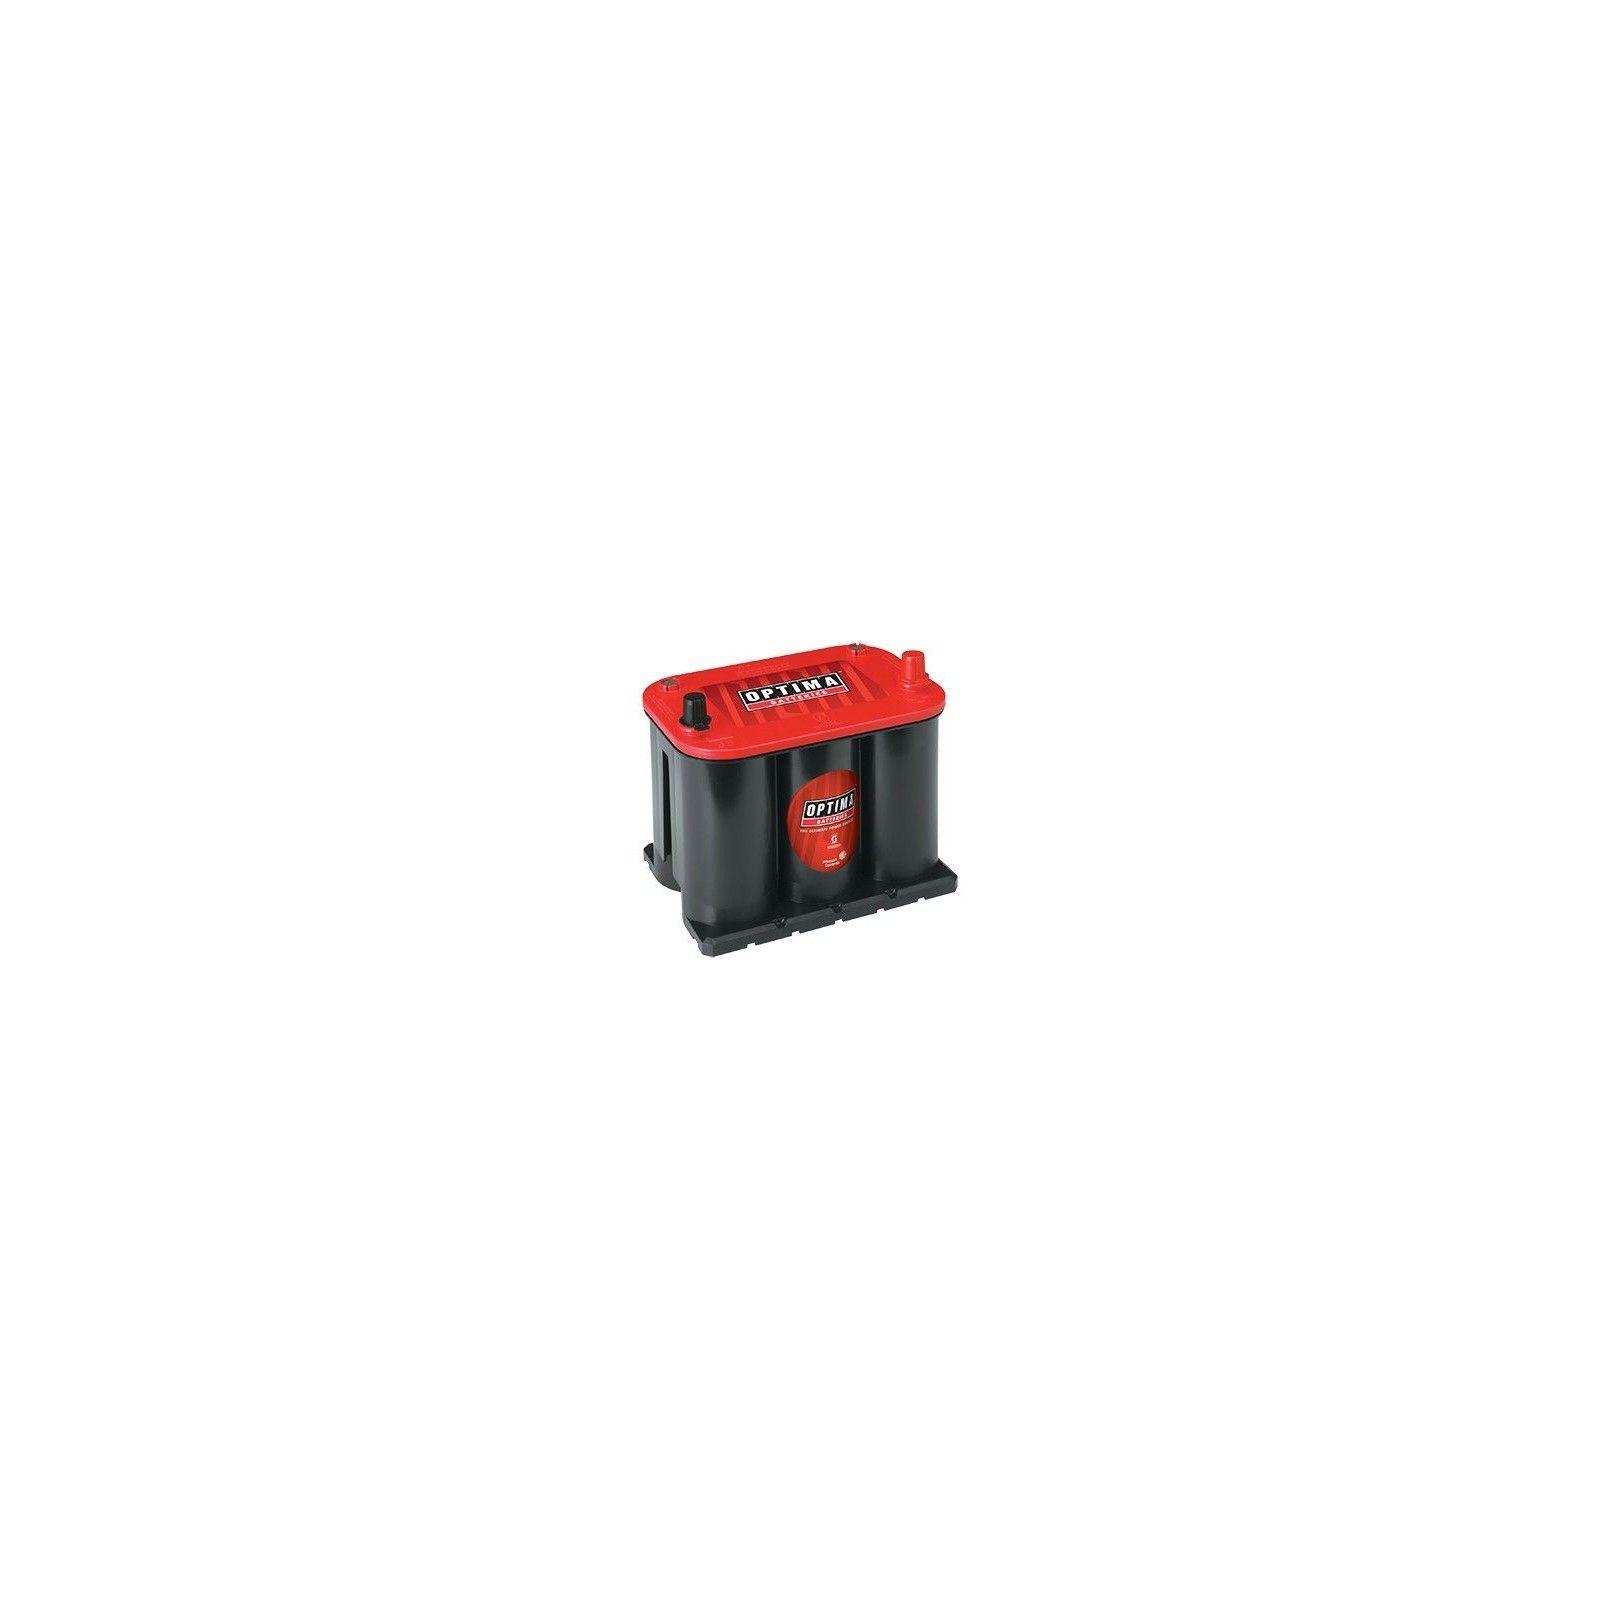 Batería Optima RTR-3.7 44Ah 730A 12V Red Top OPTIMA - 1